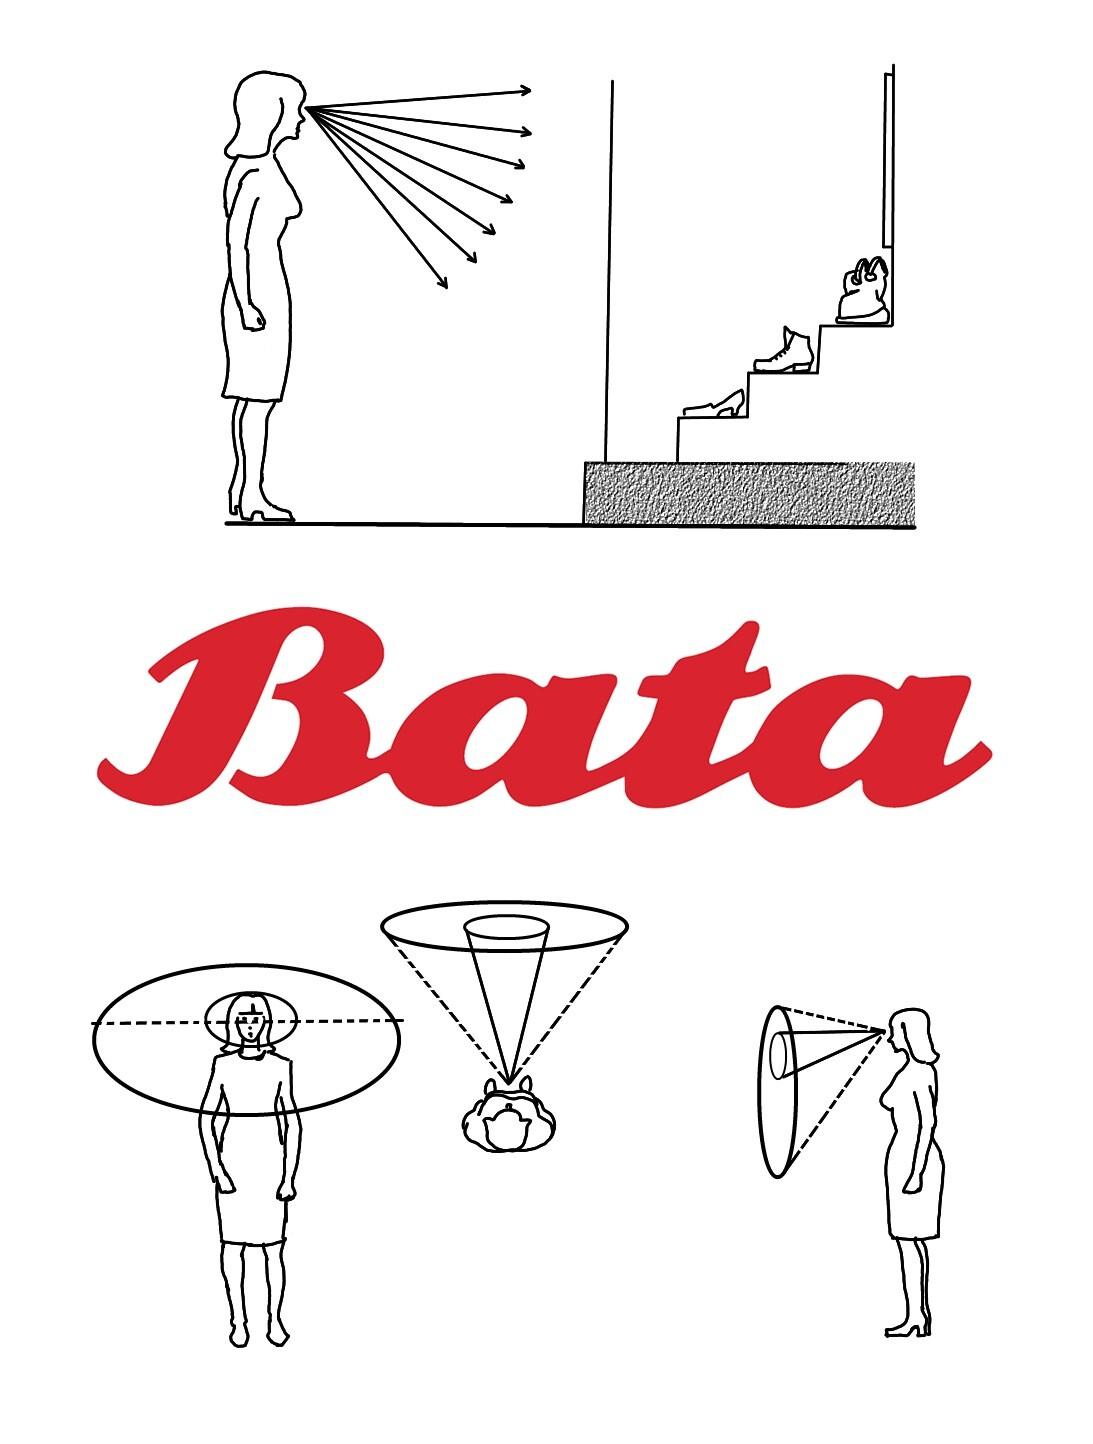 Instructional Illustration for Bata